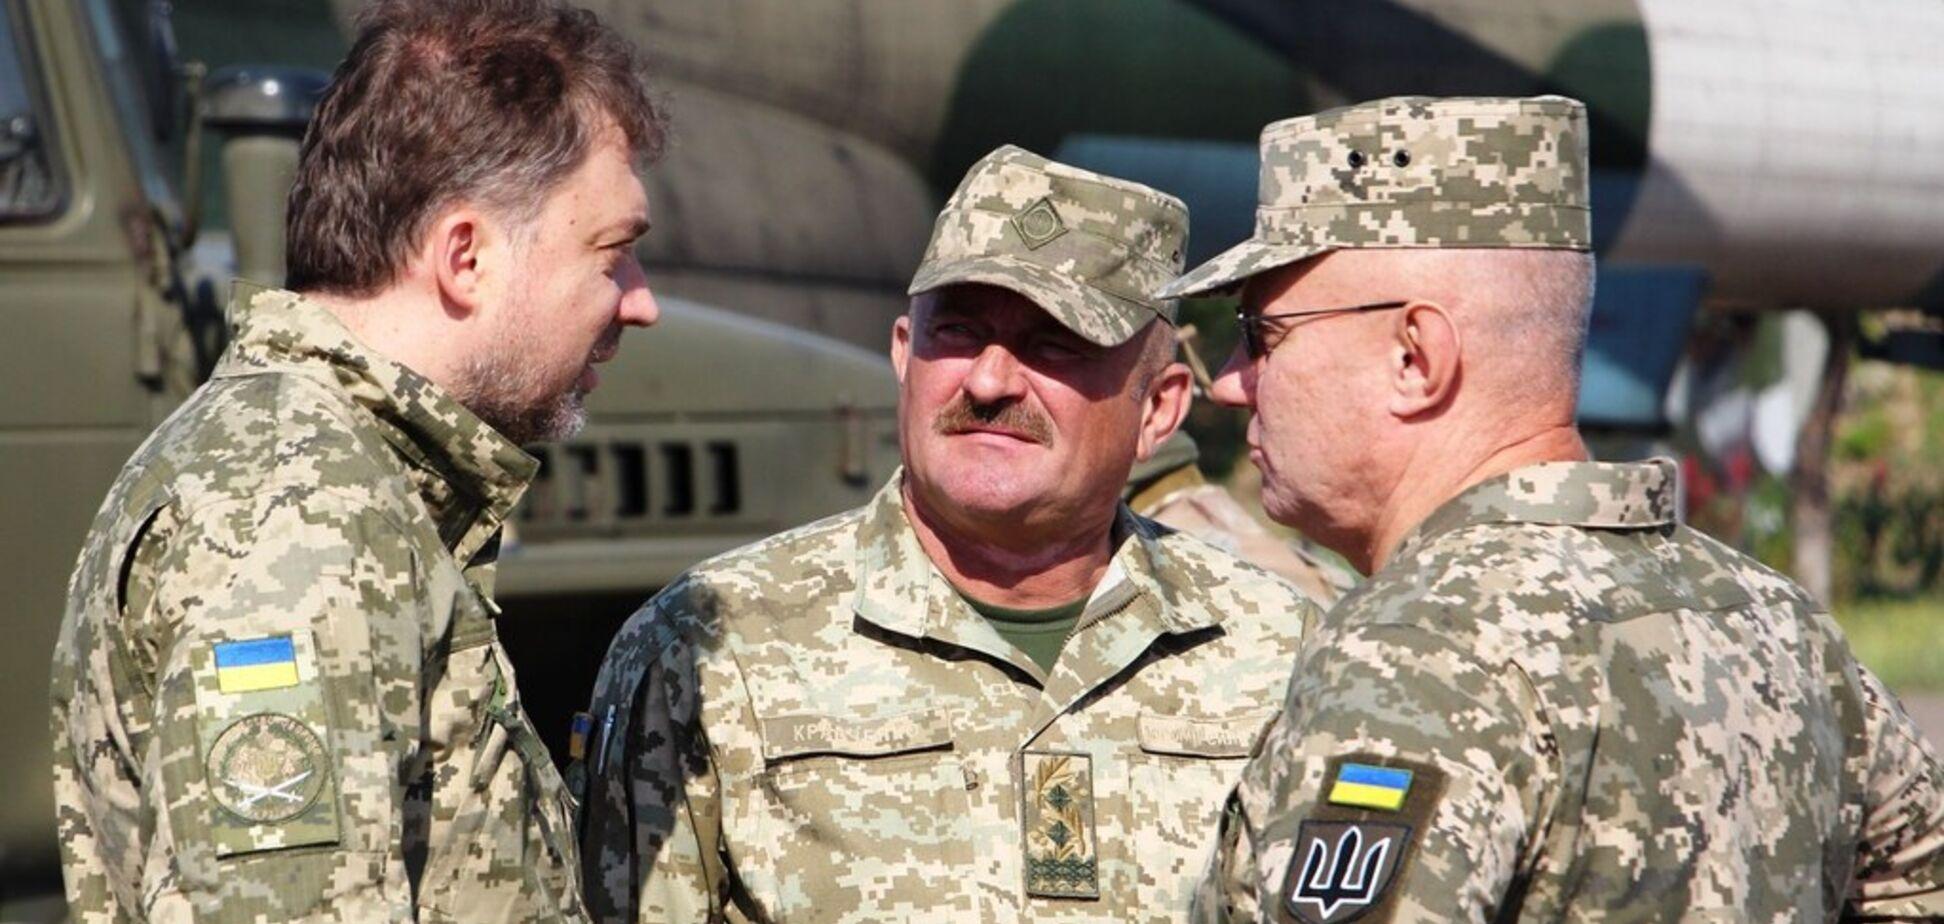 Загороднюк, Кравченко і Хомчак